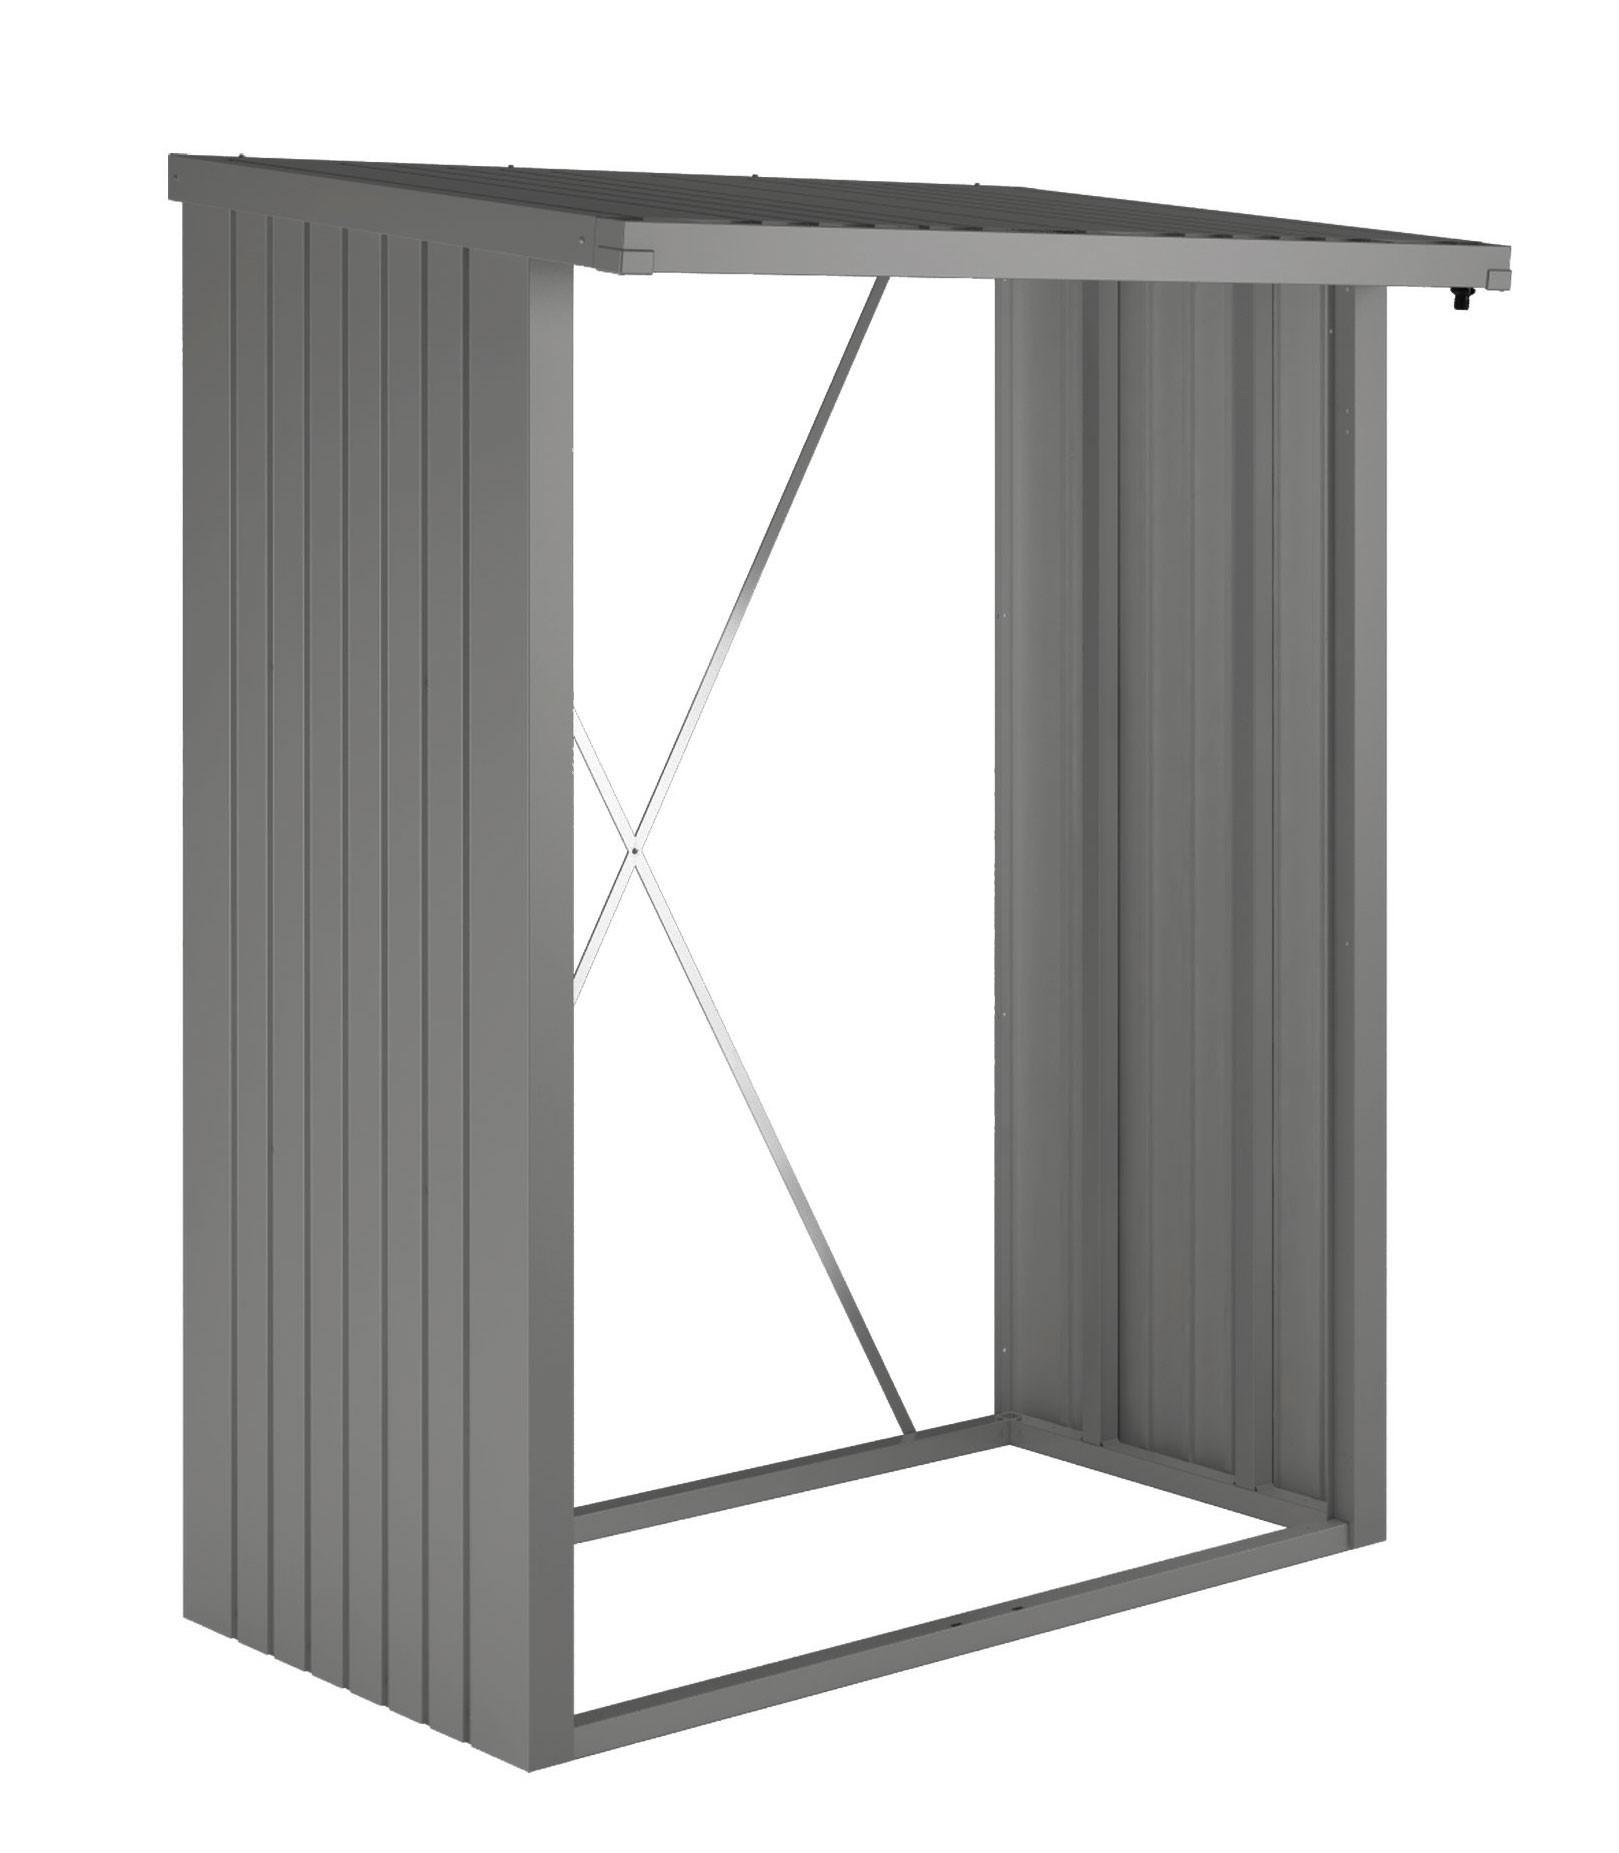 kaminholzregal ger teschrank biohort woodstock quarzgrau bei. Black Bedroom Furniture Sets. Home Design Ideas